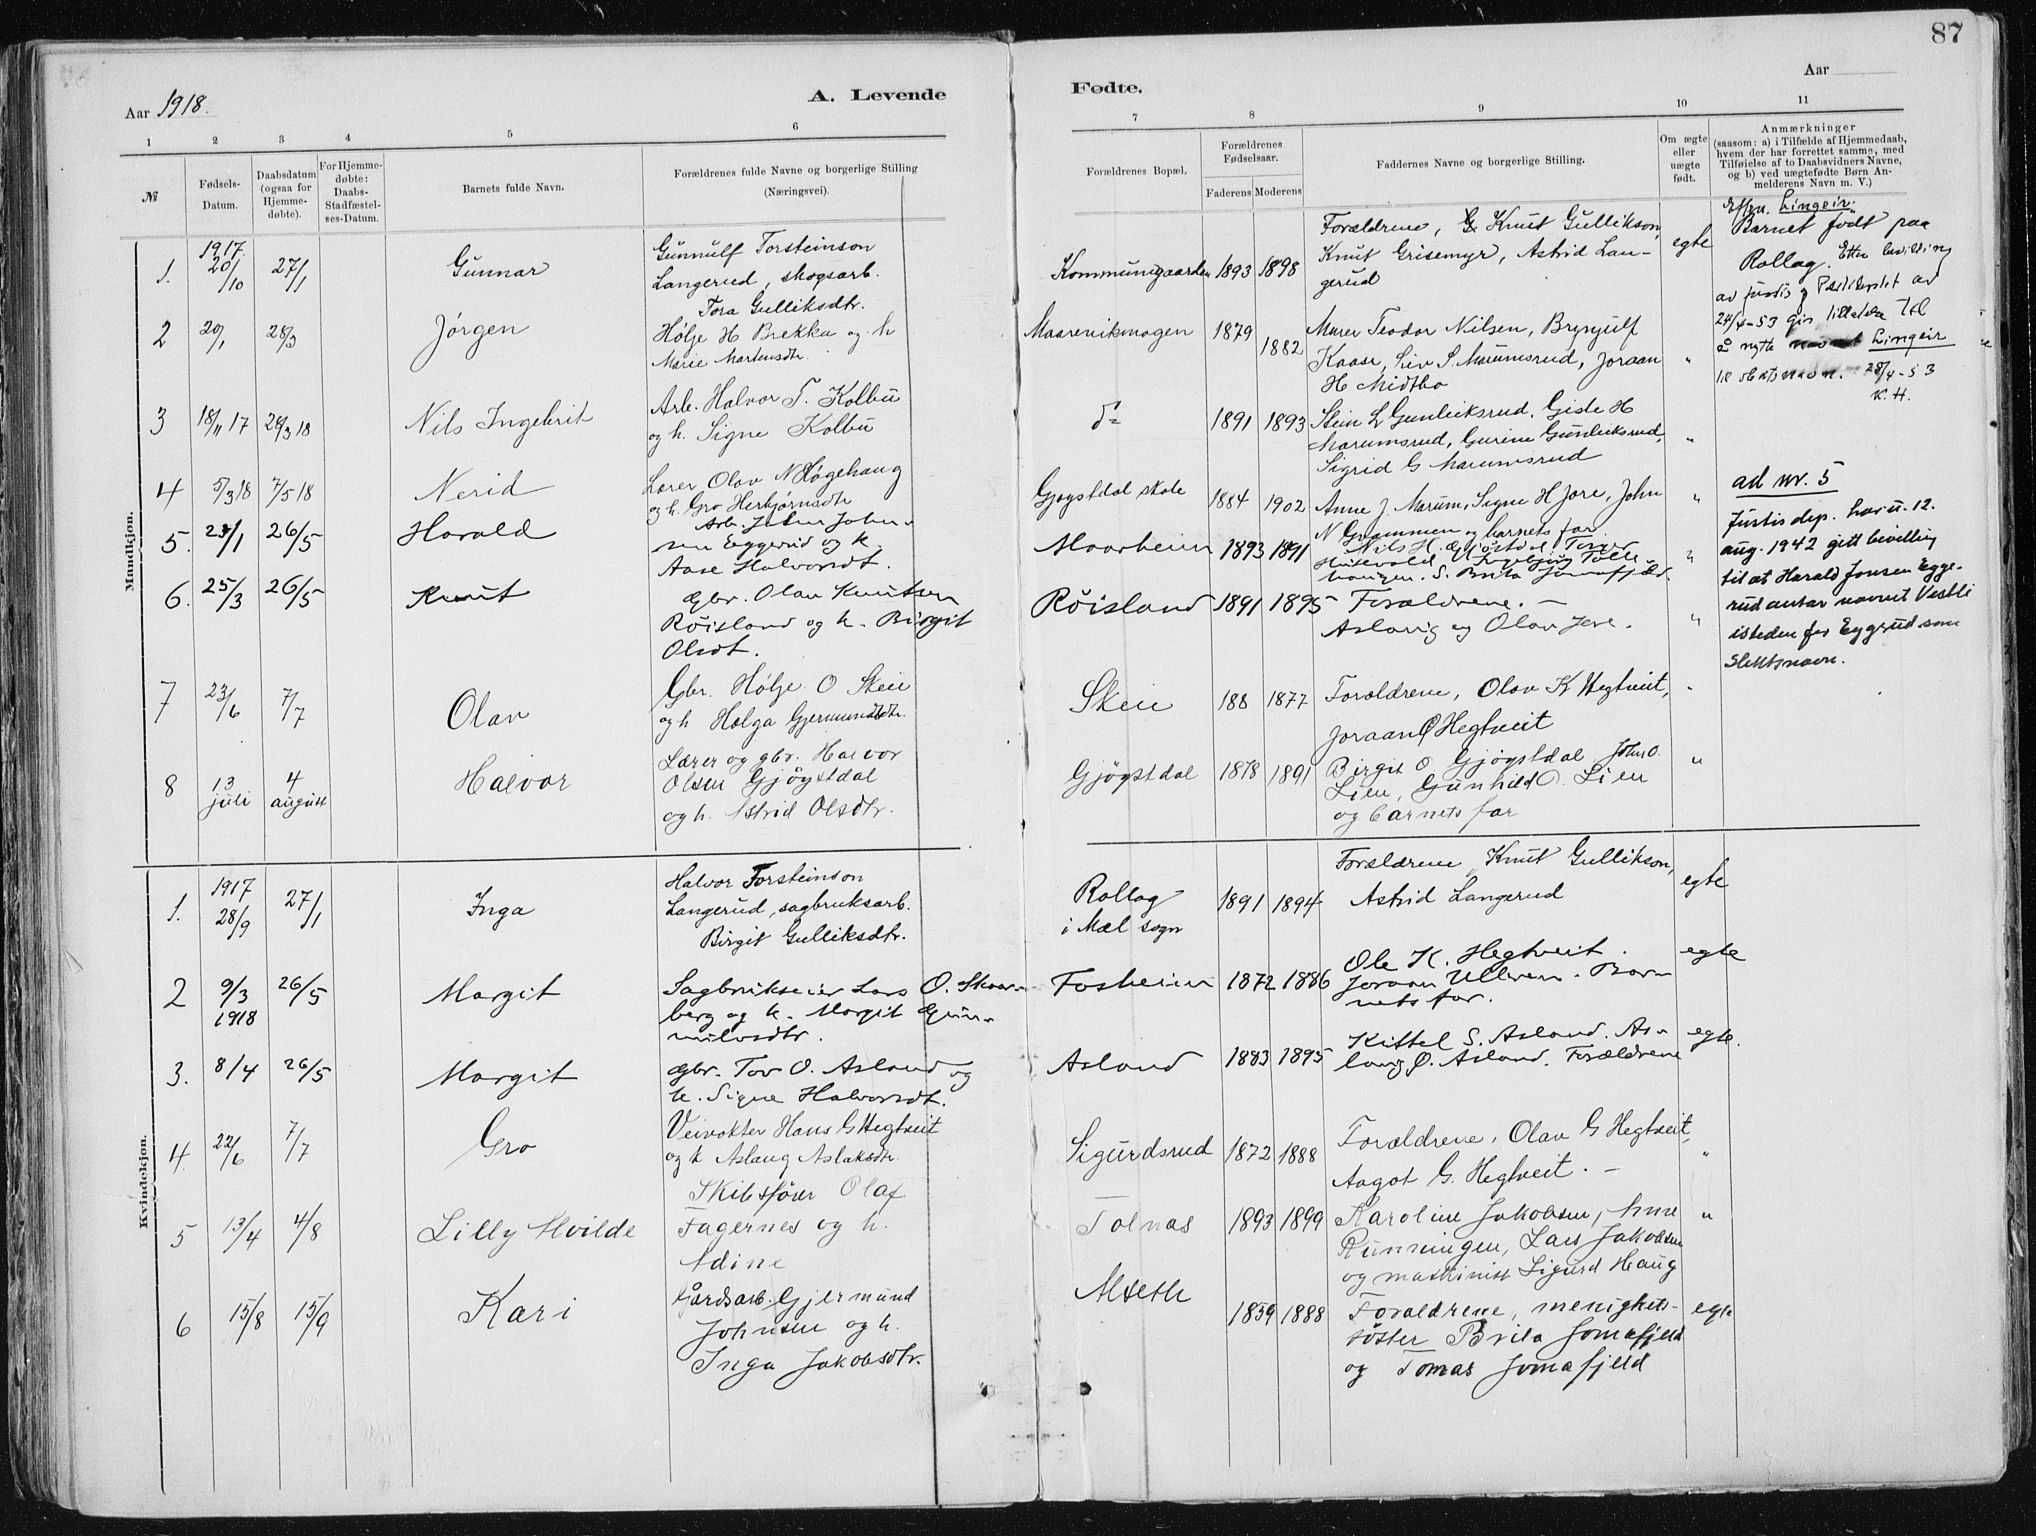 SAKO, Tinn kirkebøker, F/Fa/L0007: Ministerialbok nr. I 7, 1878-1922, s. 87